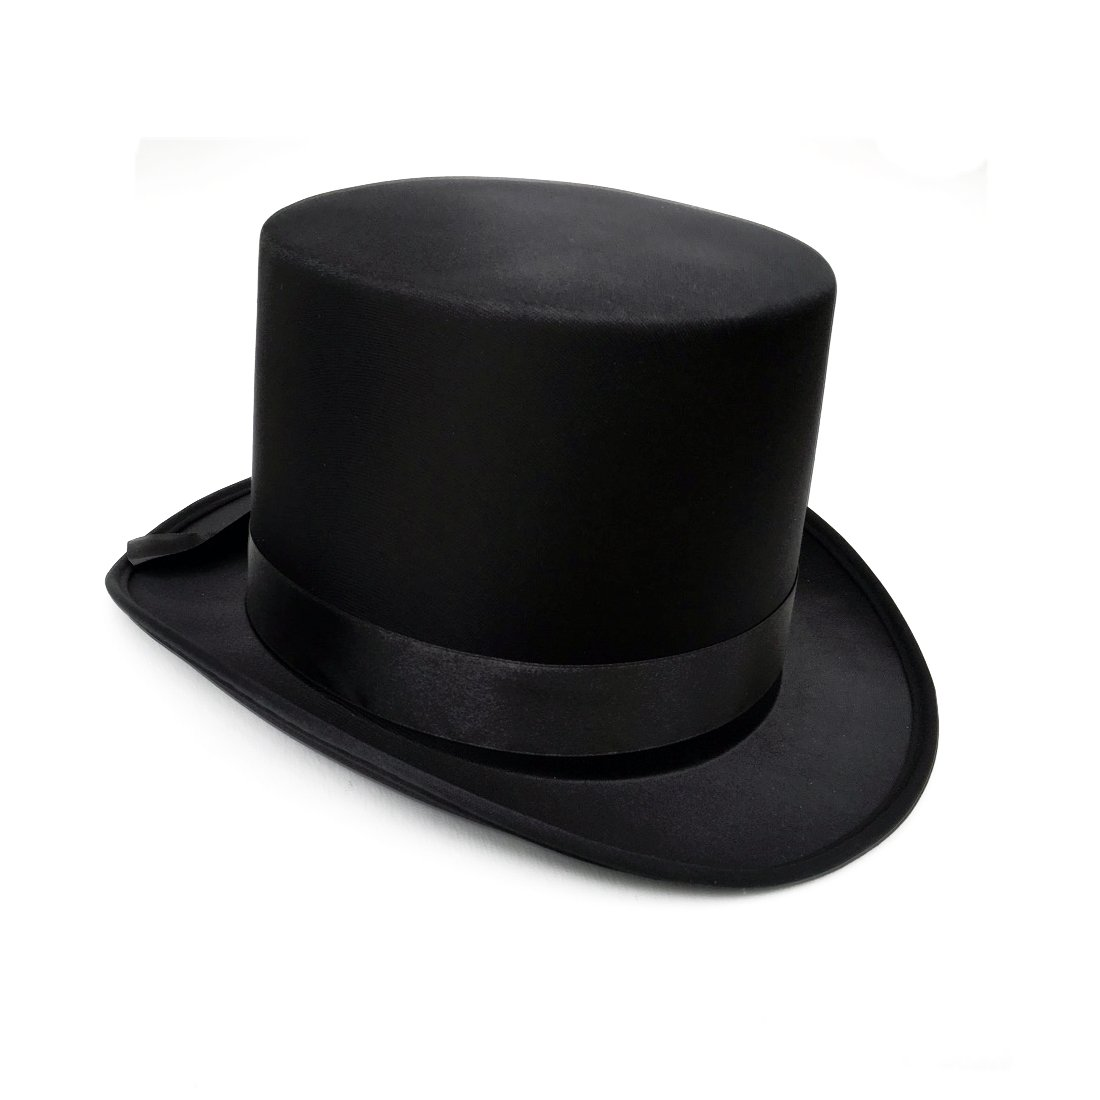 JJMS Brand Fantastic Black Top Hat Great Quality Hard Satin top Hat H7720-B